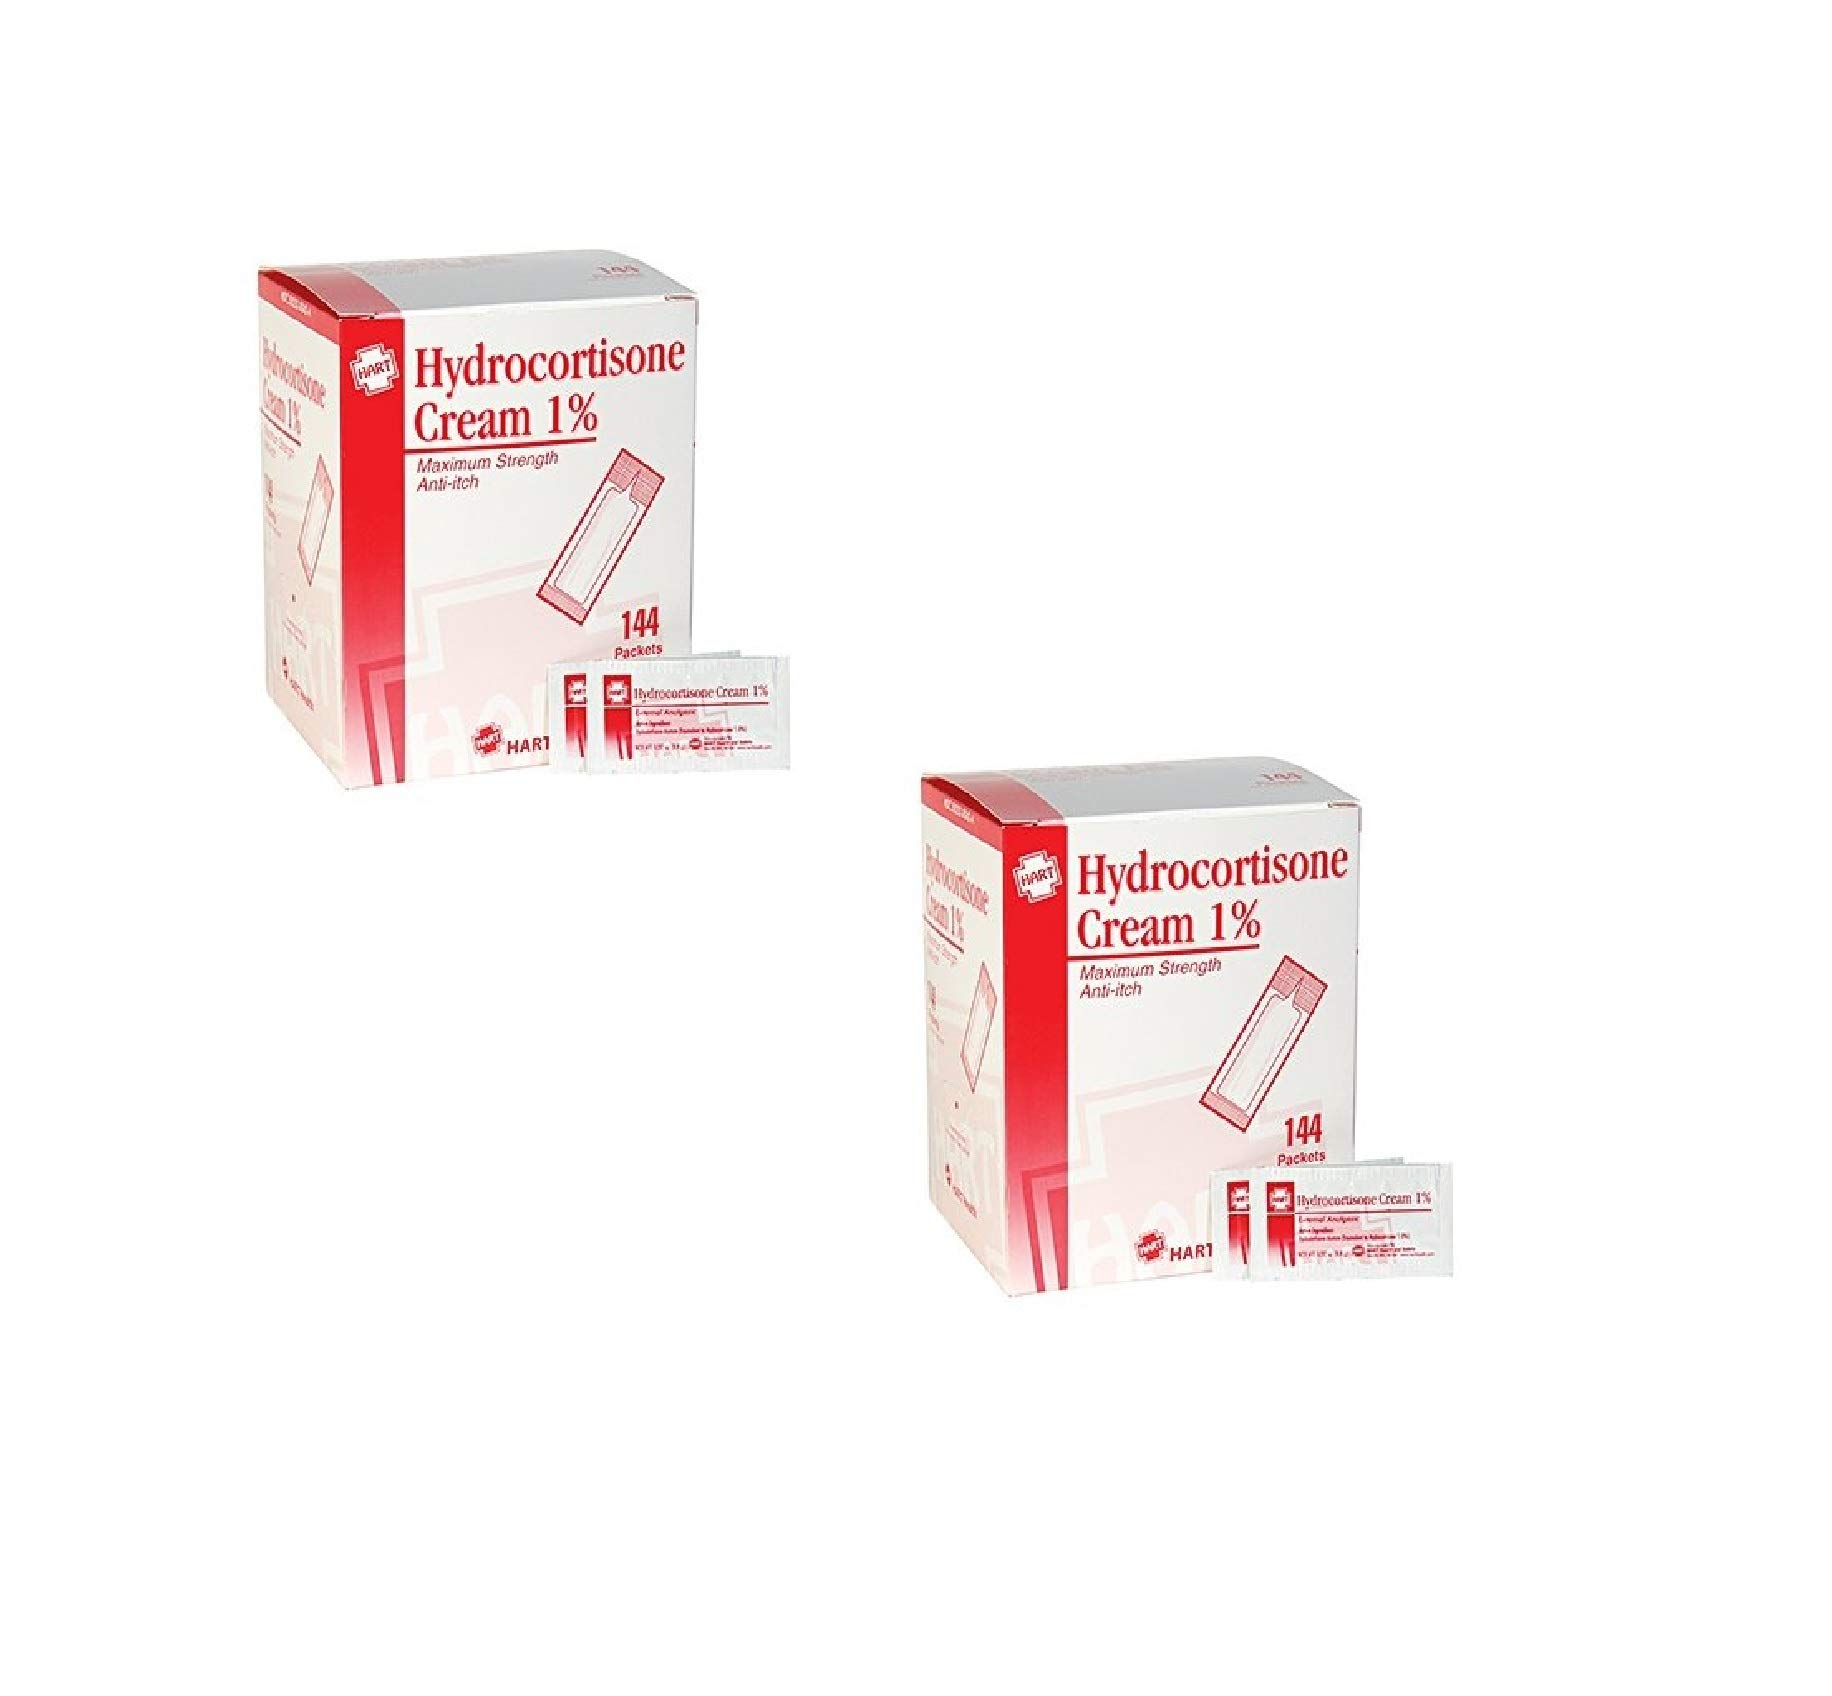 HART Health Hydrocortisone Cream 1%, Maximum Strength Anti-Itch, 144 Packets, 1/32 oz (0.9m) Each (2 Pack)